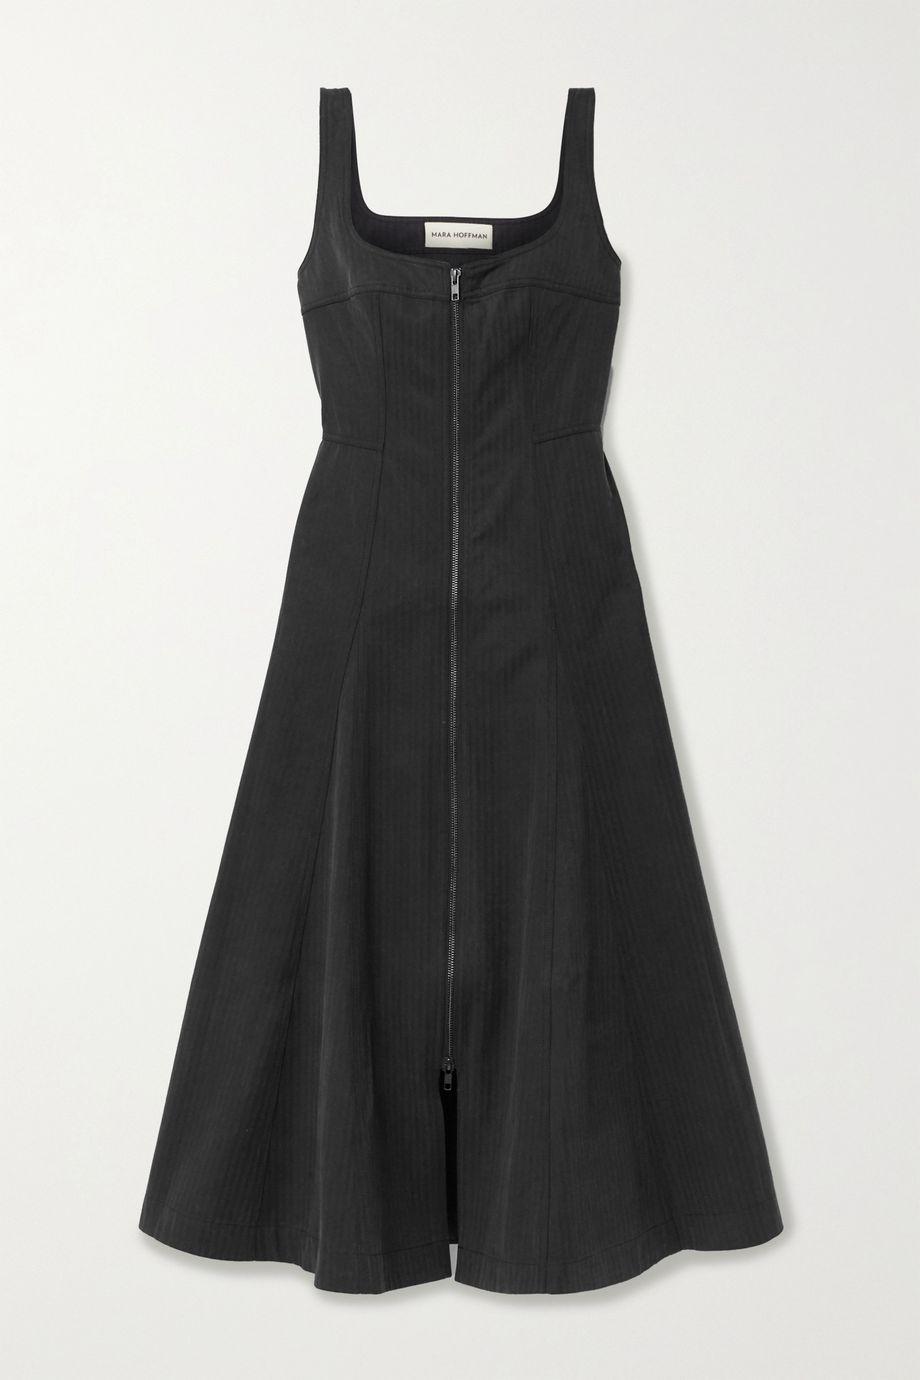 Mara Hoffman + NET SUSTAIN Adriana striped Tencel Lyocell and organic cotton-blend midi dress